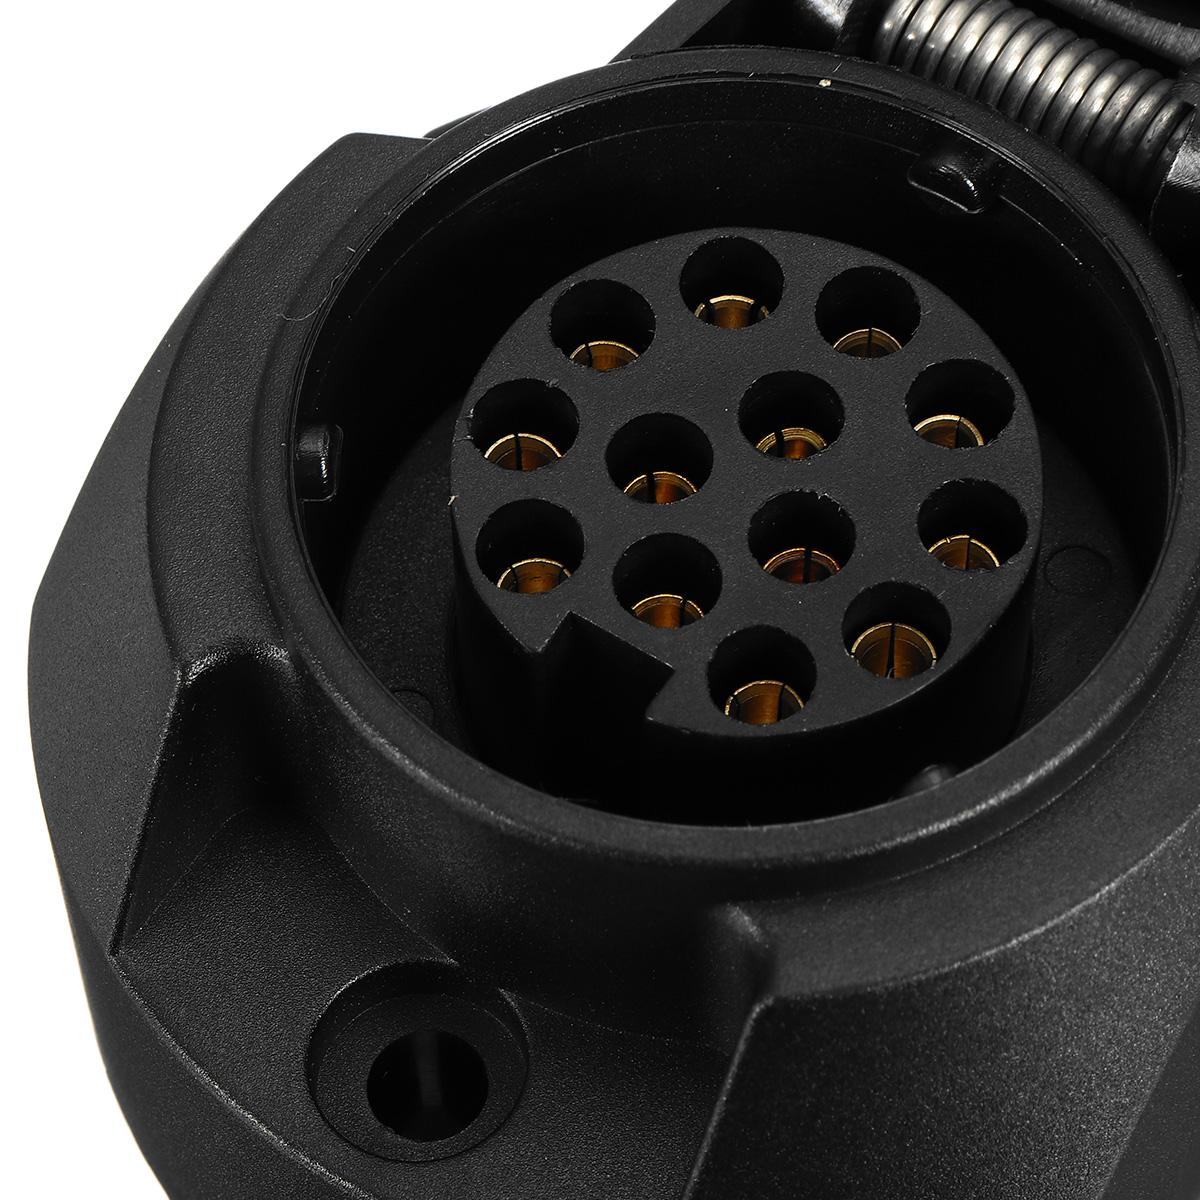 caravan grey socket wiring diagram door frame parts 12v 13pin european standard tow bar electrical